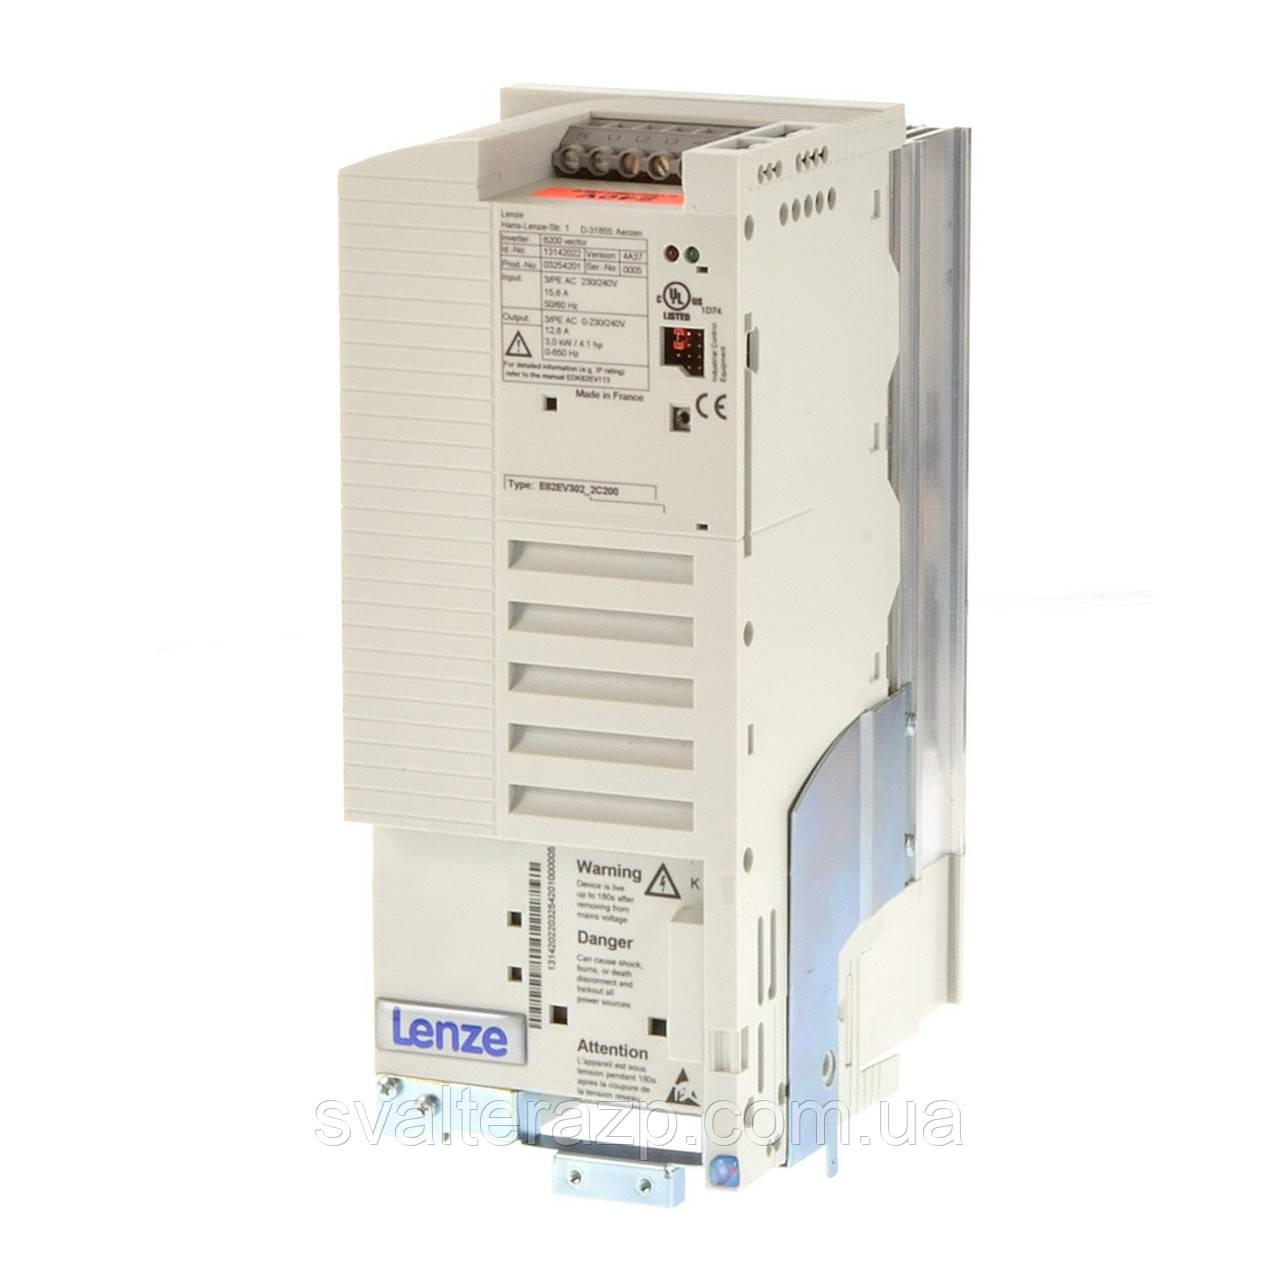 Перетворювач частоти Lenze Vector E82EV752K4C